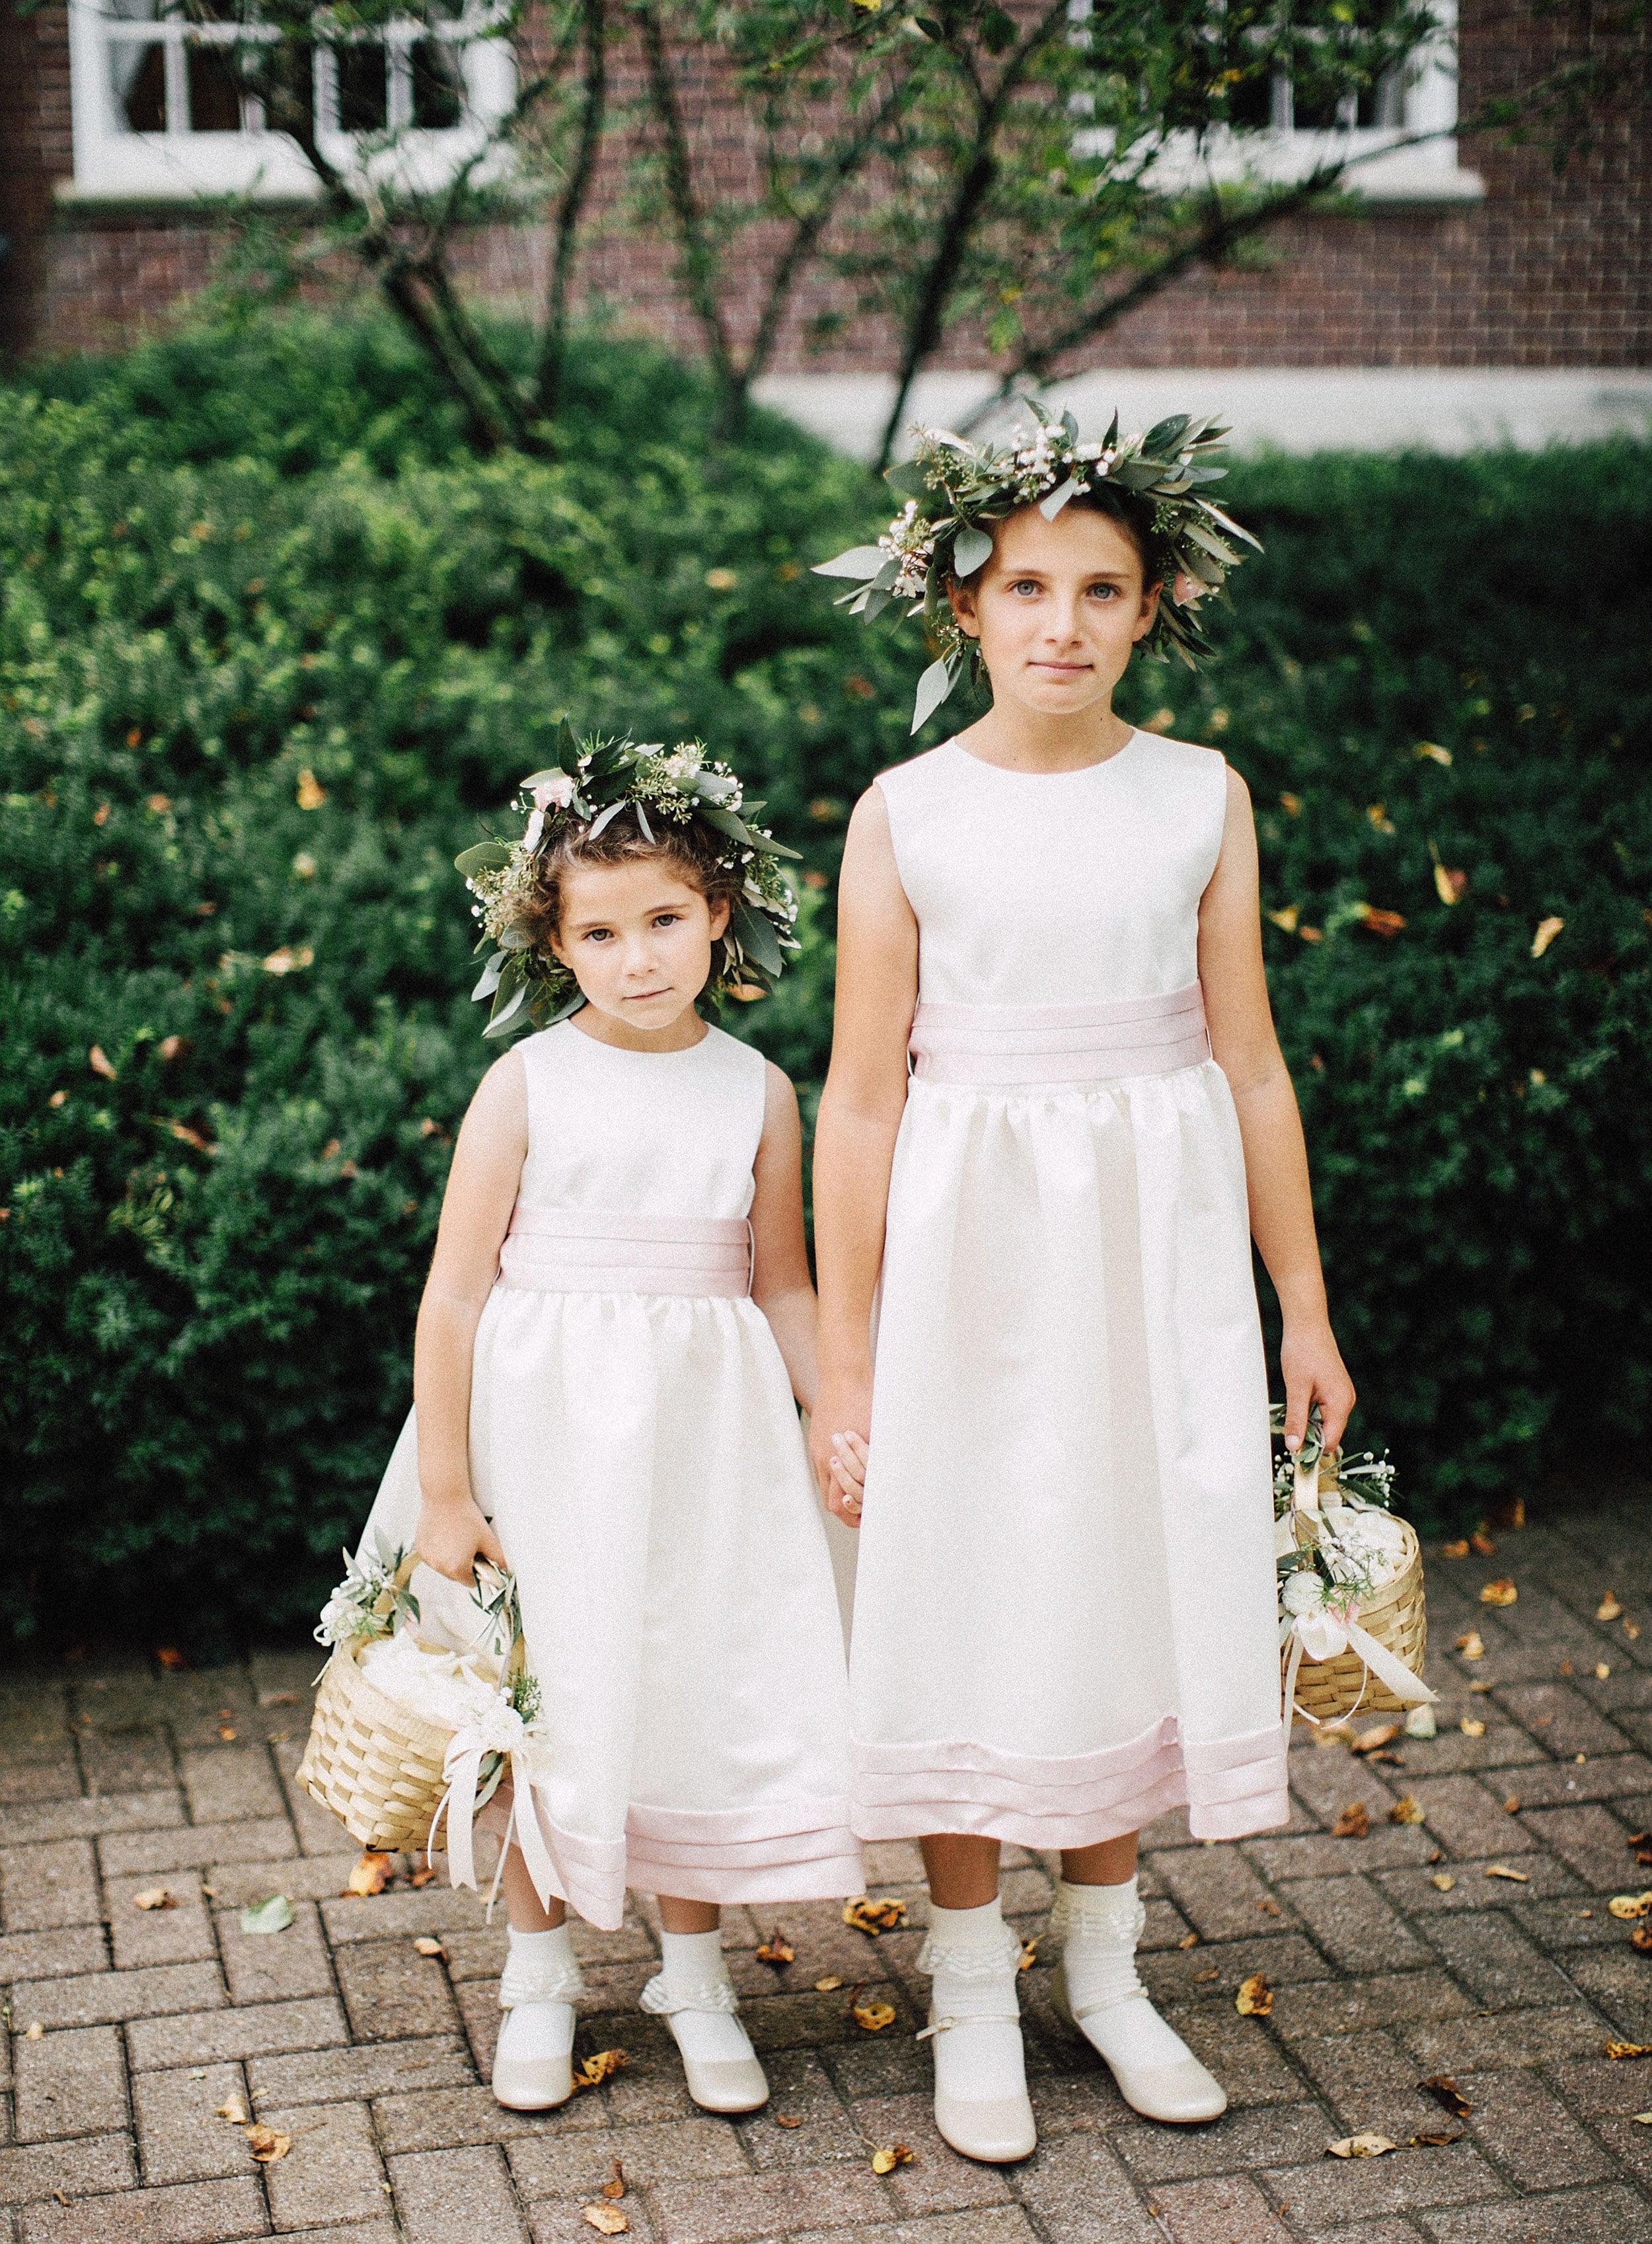 spindletop-lexington-wedding-photographer-015.JPG